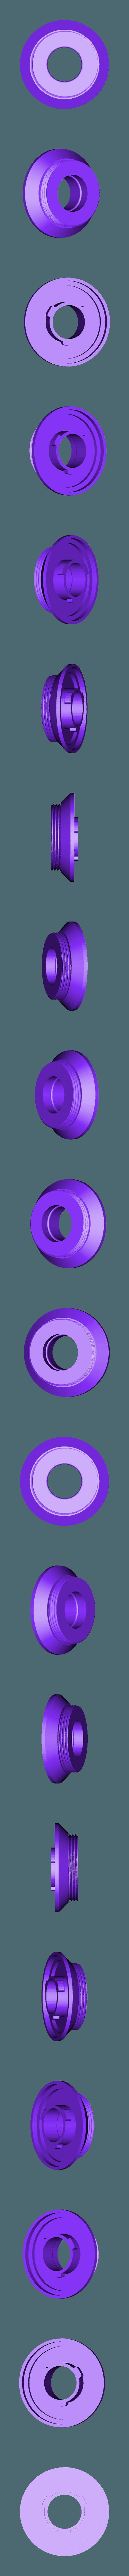 Coupler V3 (P).stl Download free STL file  VMO MASK V3 - 3D-PRINTED PROTECTIVE- Coronavirus COVID-19 (Improved Version) • Model to 3D print, victorottati